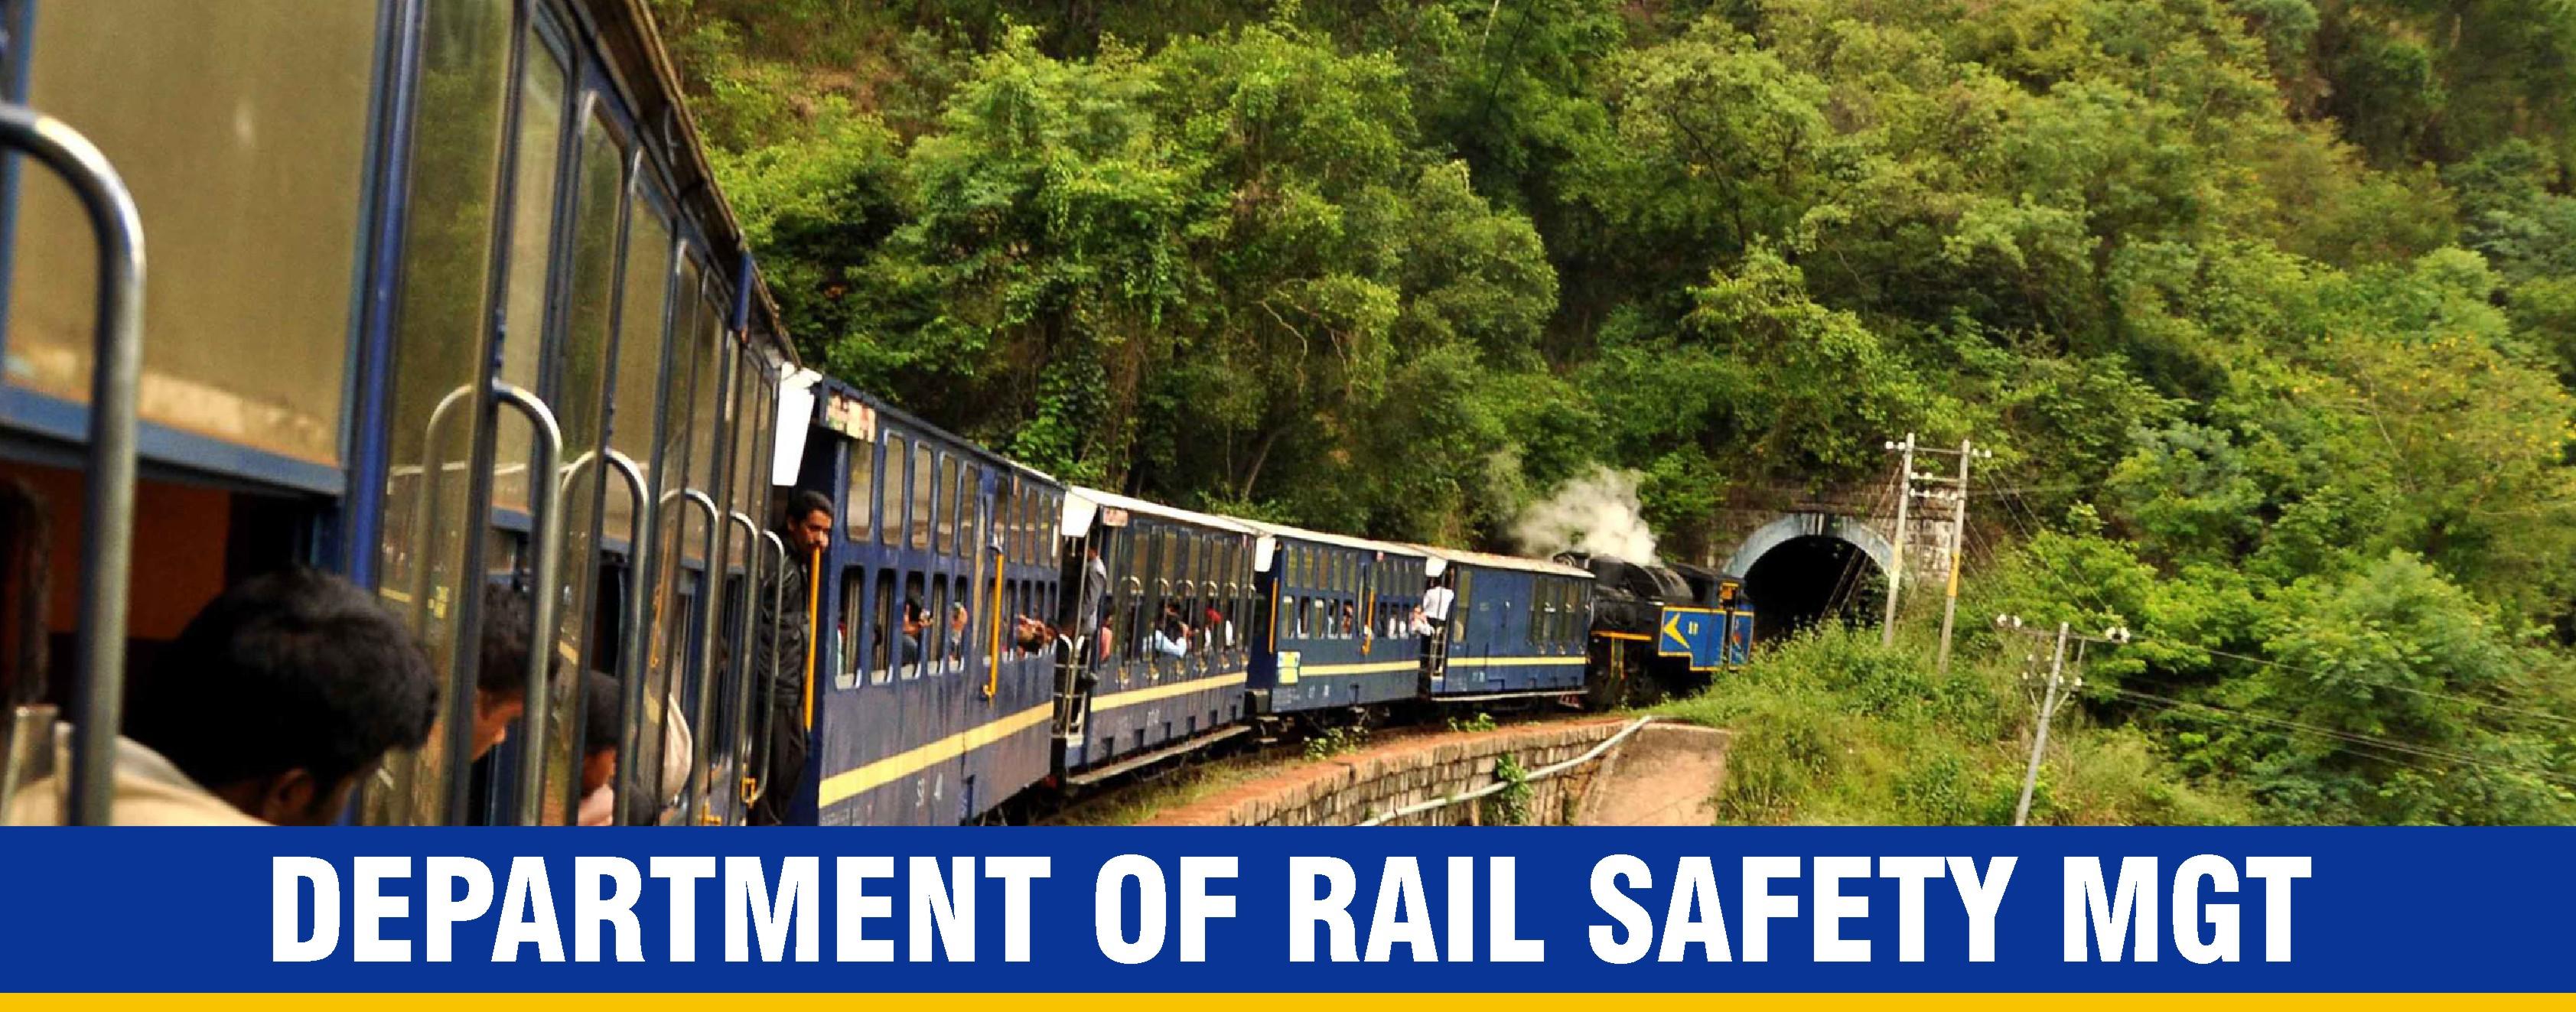 Aset Dept Of Rail Safety